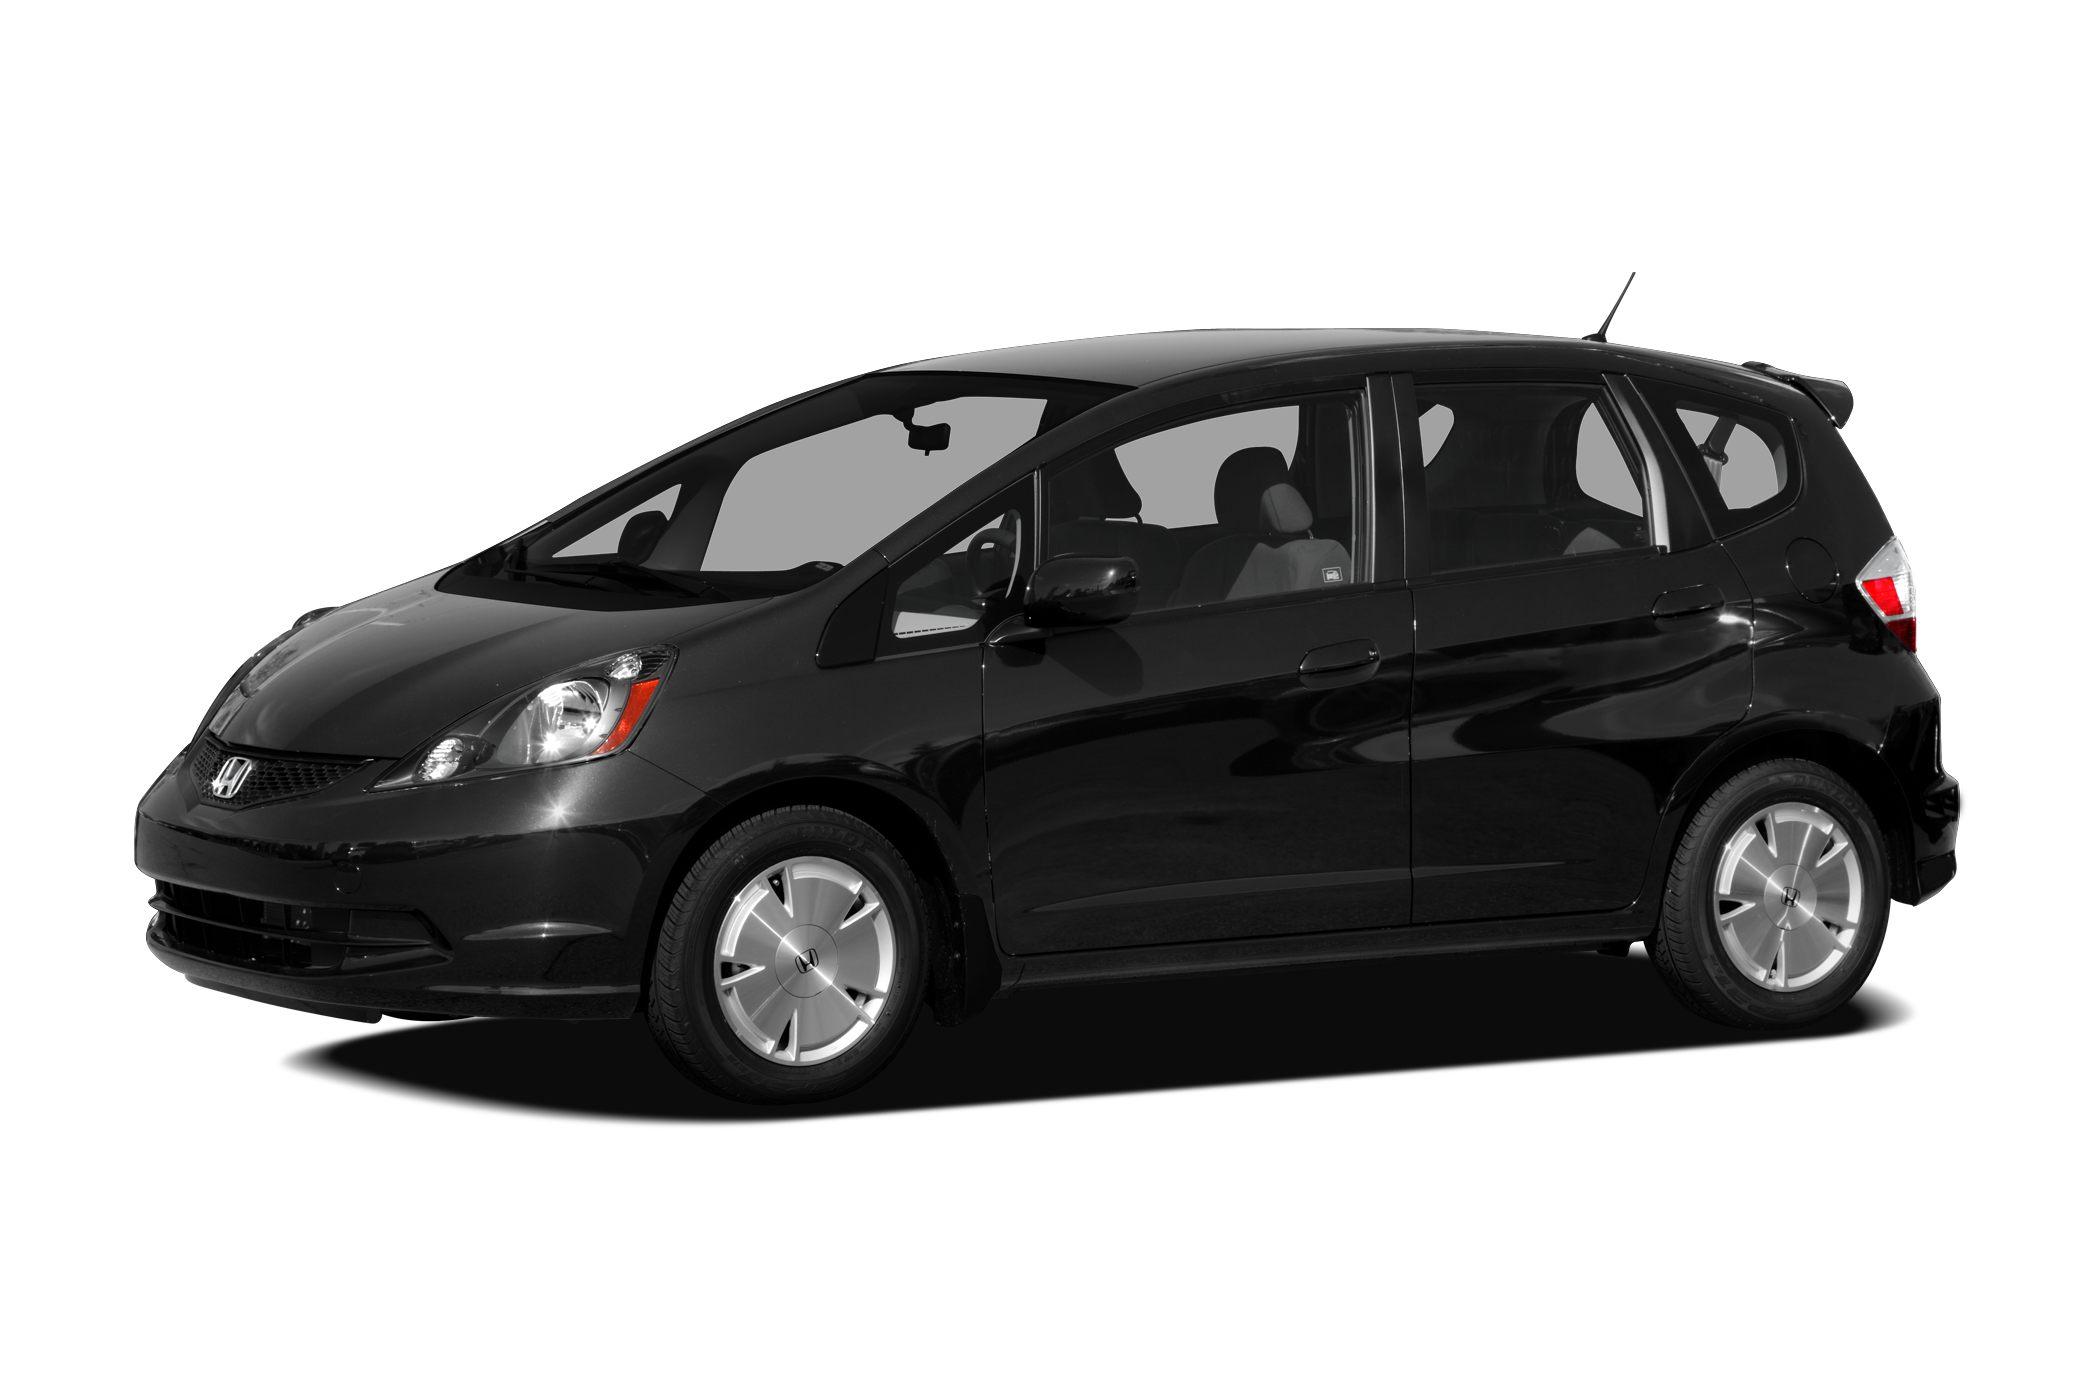 2010 Honda Fit Hatchback for sale in Shreveport for $11,398 with 47,376 miles